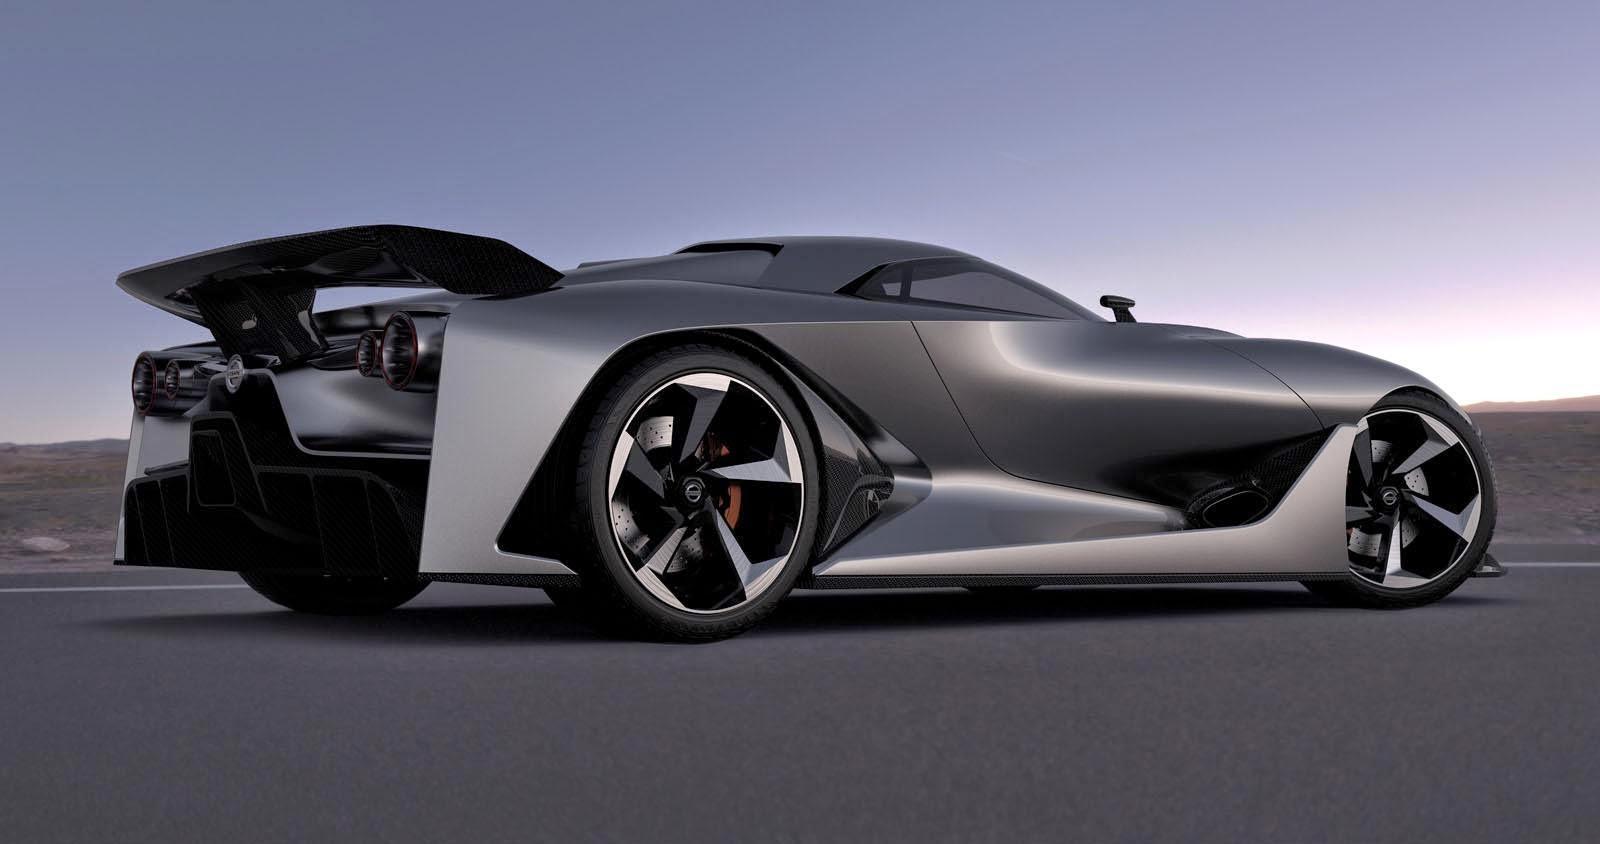 [Resim: Nissan+Concept+2020+Vision+Gran+Turismo+2.jpg]